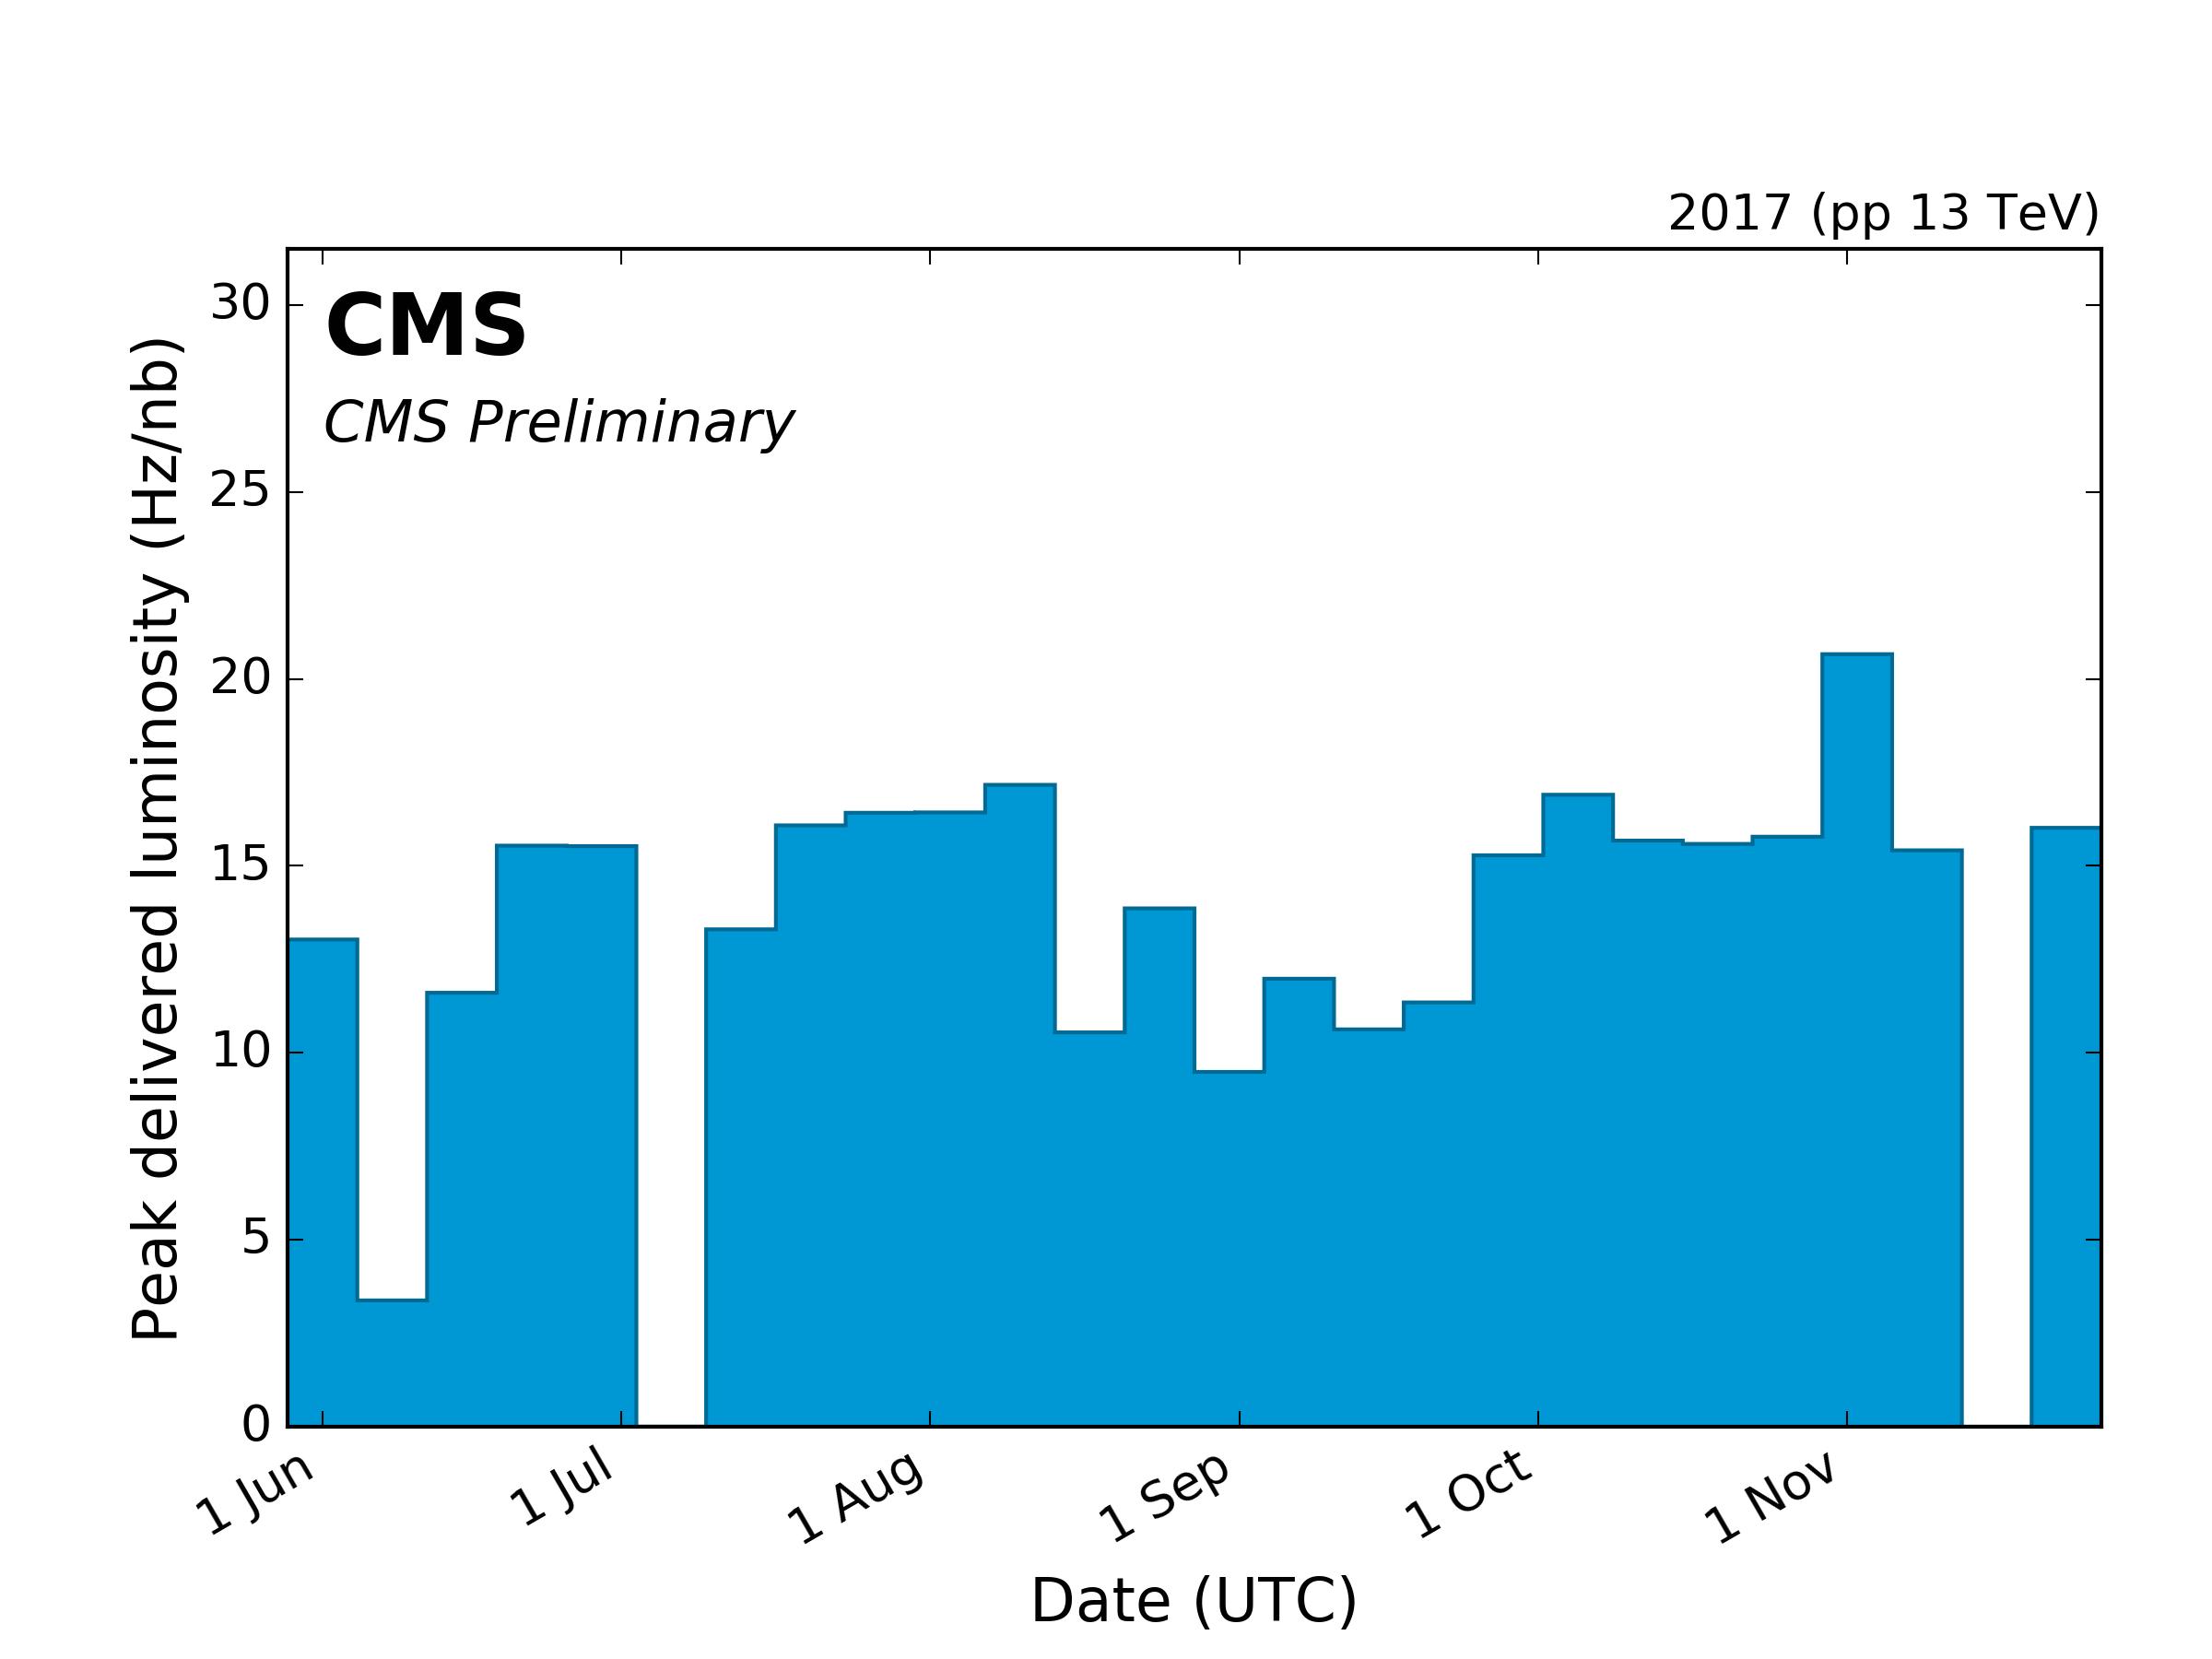 https://cern.ch/cmslumi/publicplots/peak_lumi_per_week_pp_2017NormtagLumi.png